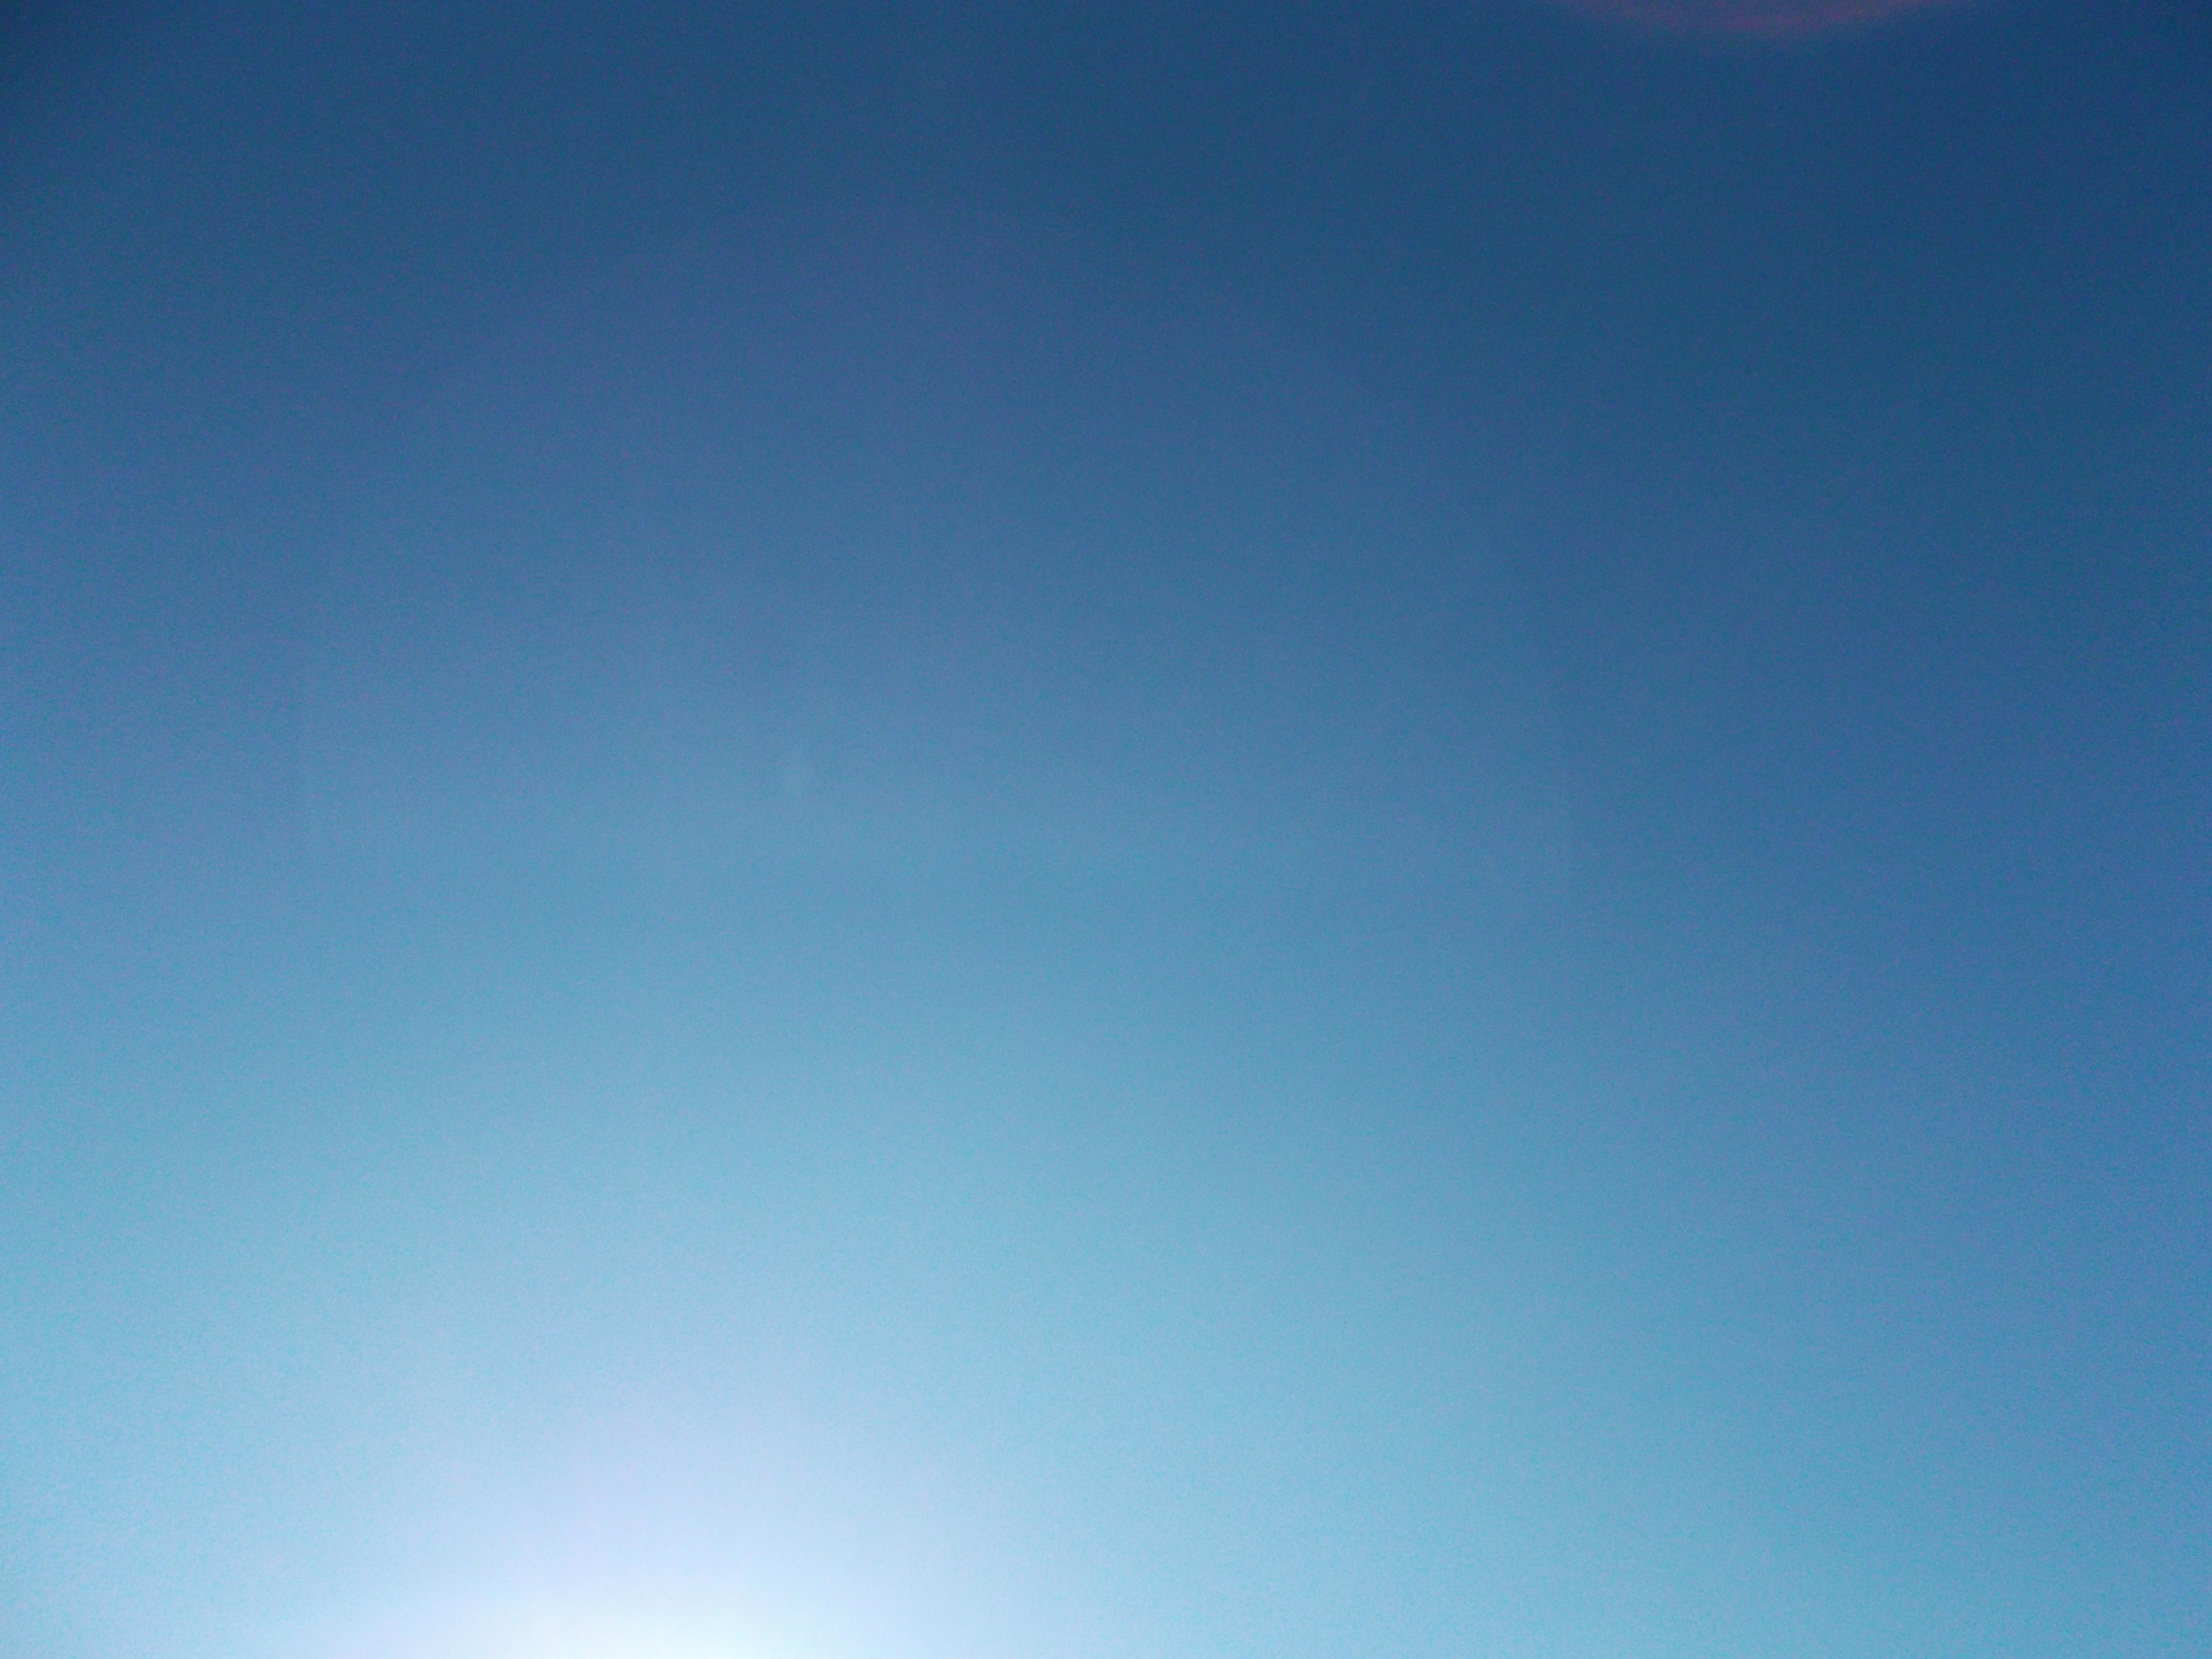 2013-05-02 Longitude -0.371 Latitude 49.182 Altitude 29 Heure 14h42